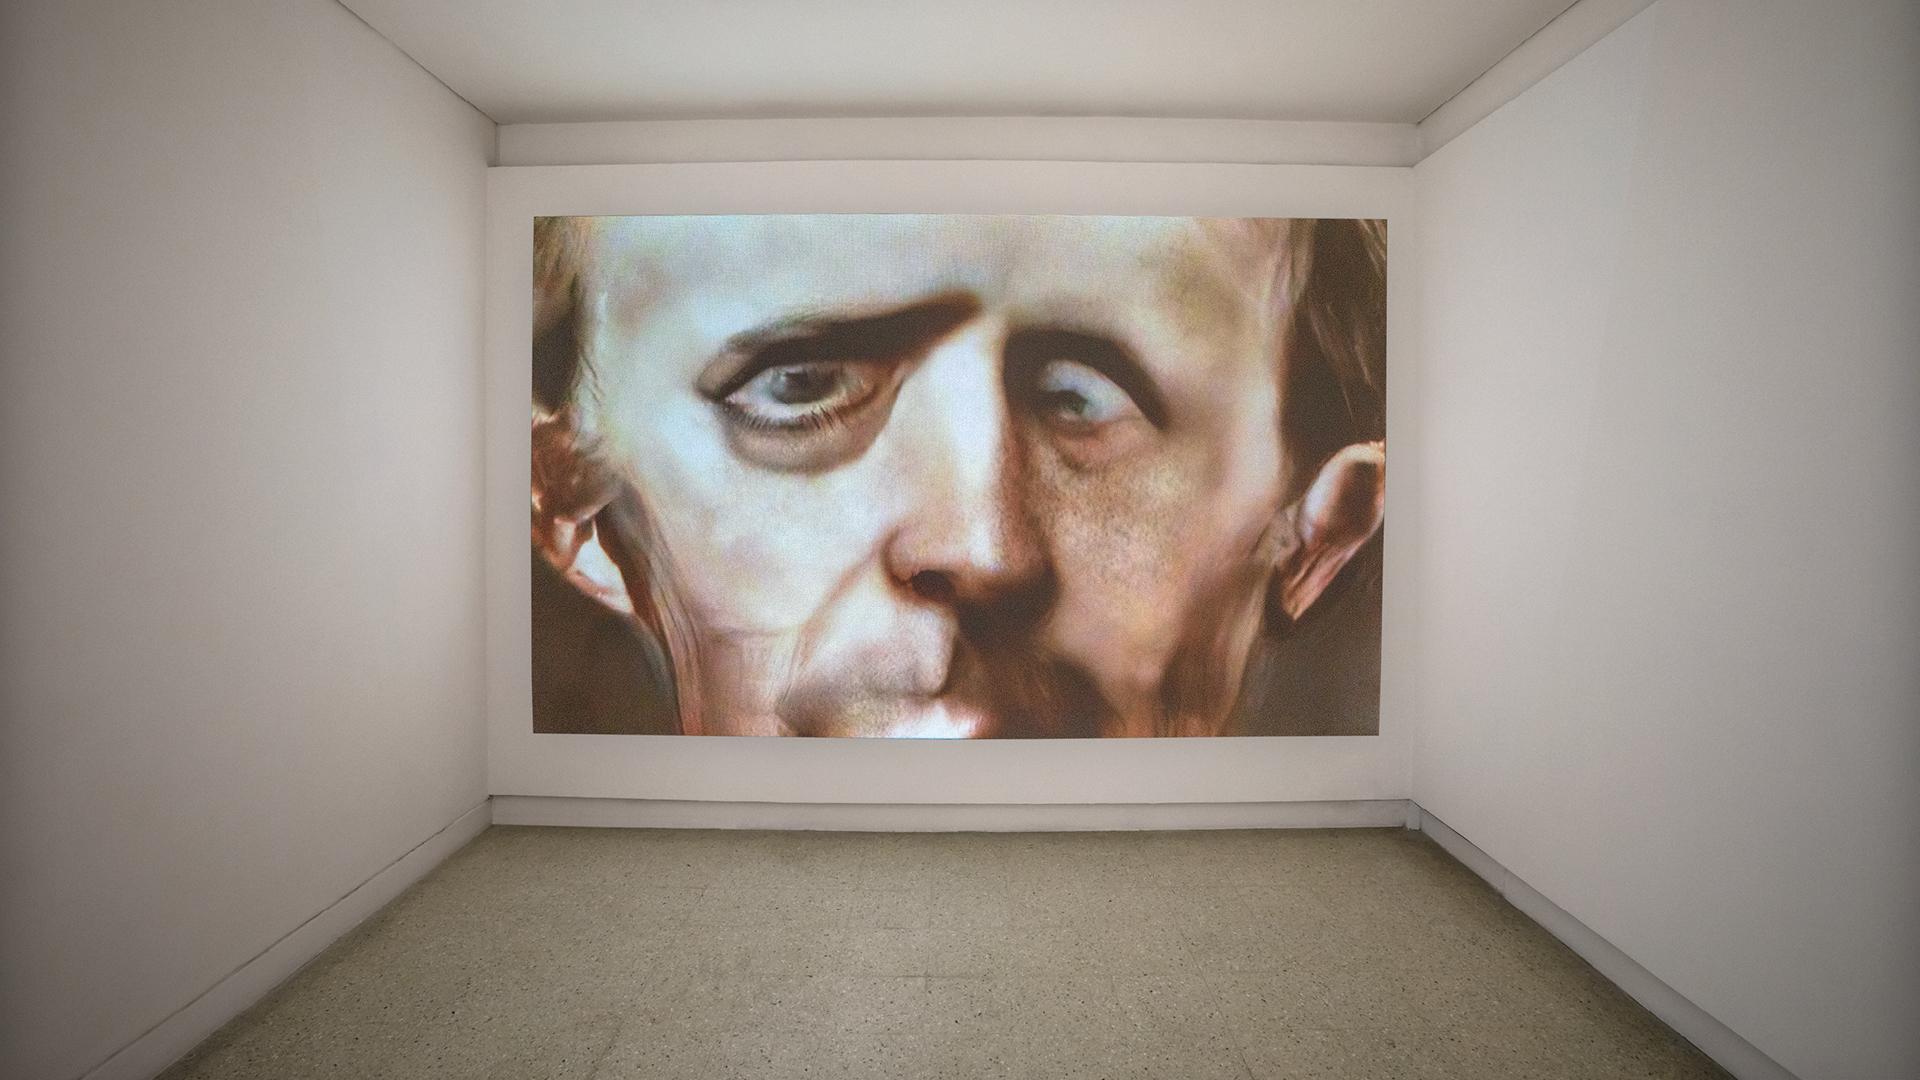 Mario Klingemann, Gradient Descent, Nature Morte art gallery | Aparajita Jain | STIRworld